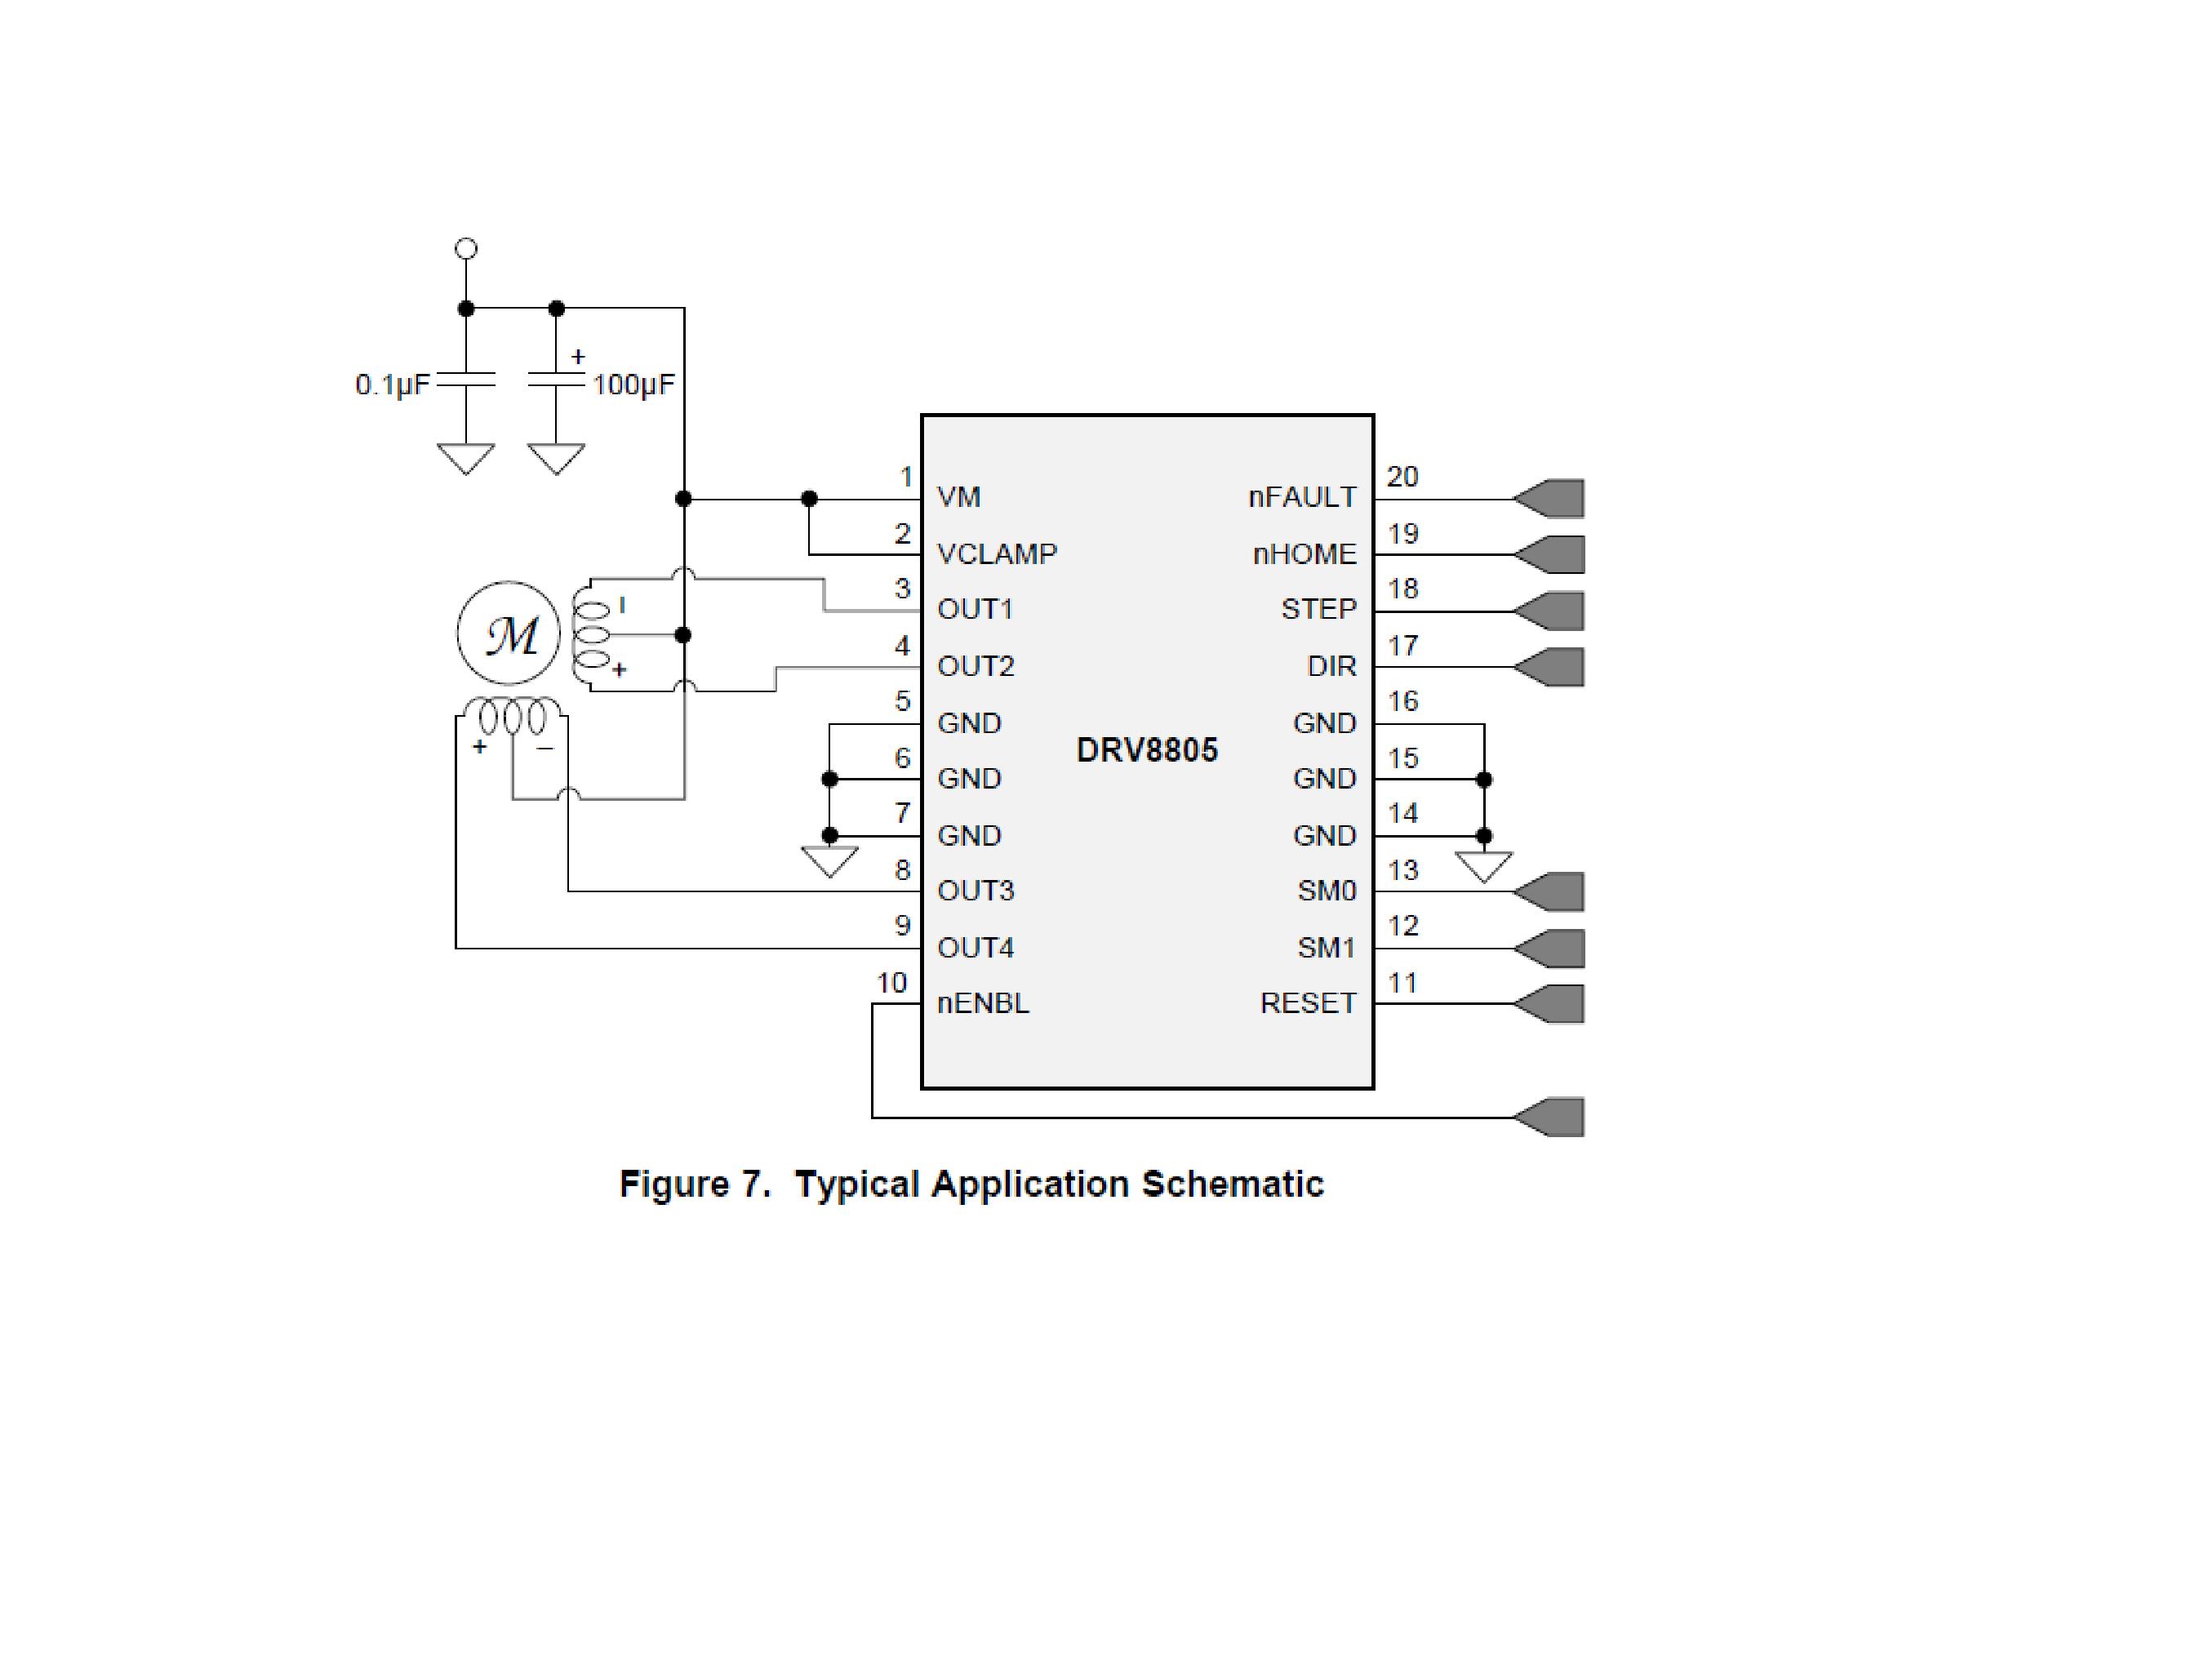 Sakai Wiring Diagram Schematic Diagrams Dryer Motor 115v X603 Drv8805 Excitation Procedure Drivers Forum Ford